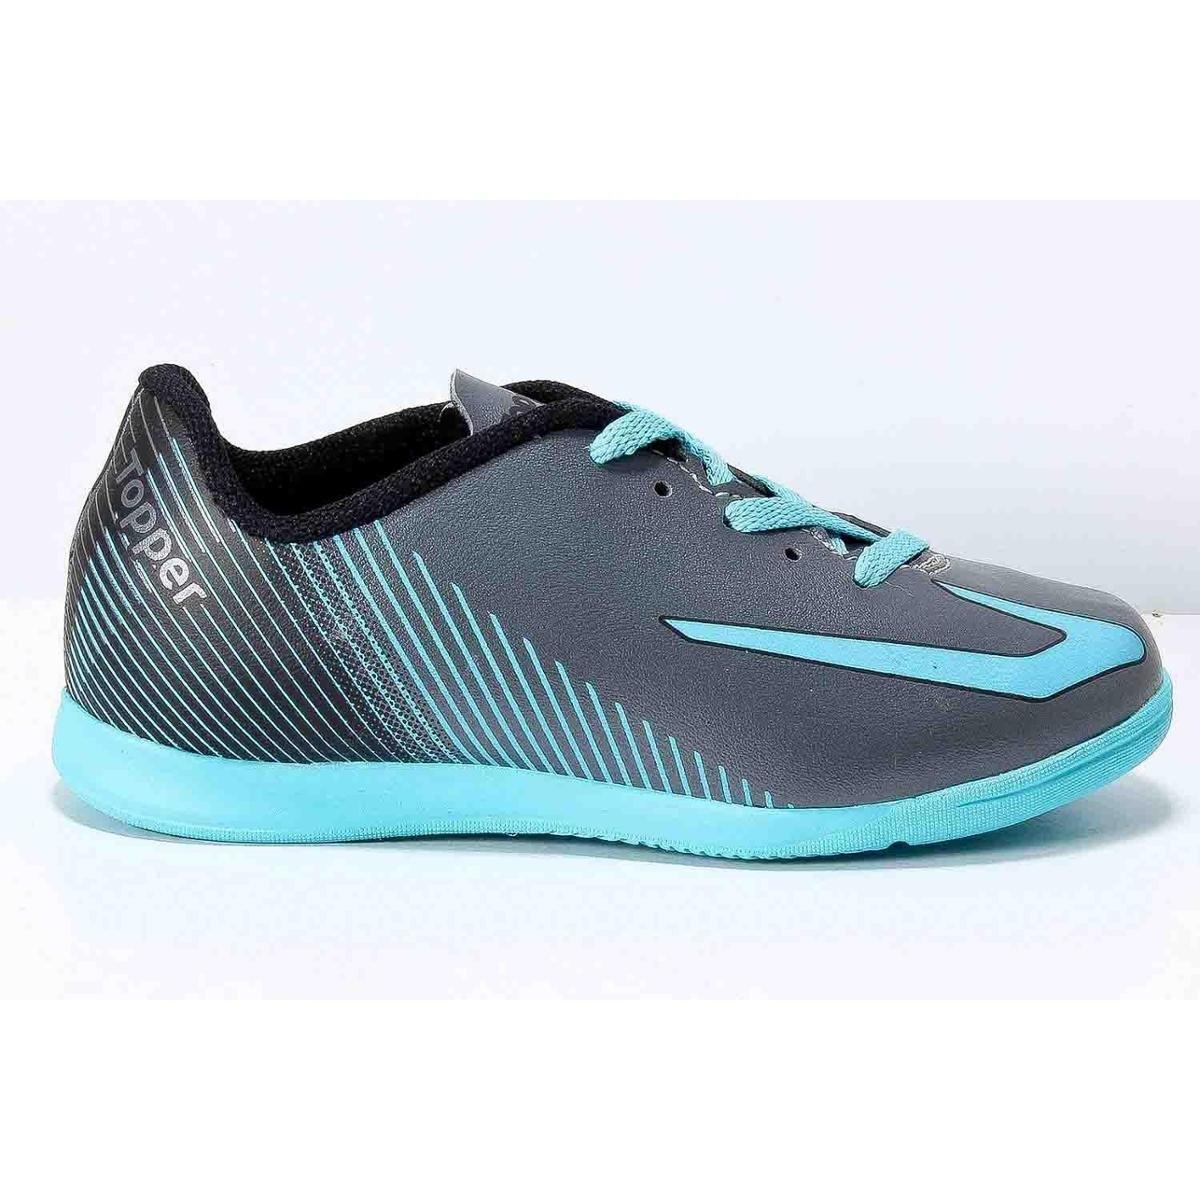 624590f6f7 Chuteira Topper Ultra Indoor Futsal Infantil - Compre Agora